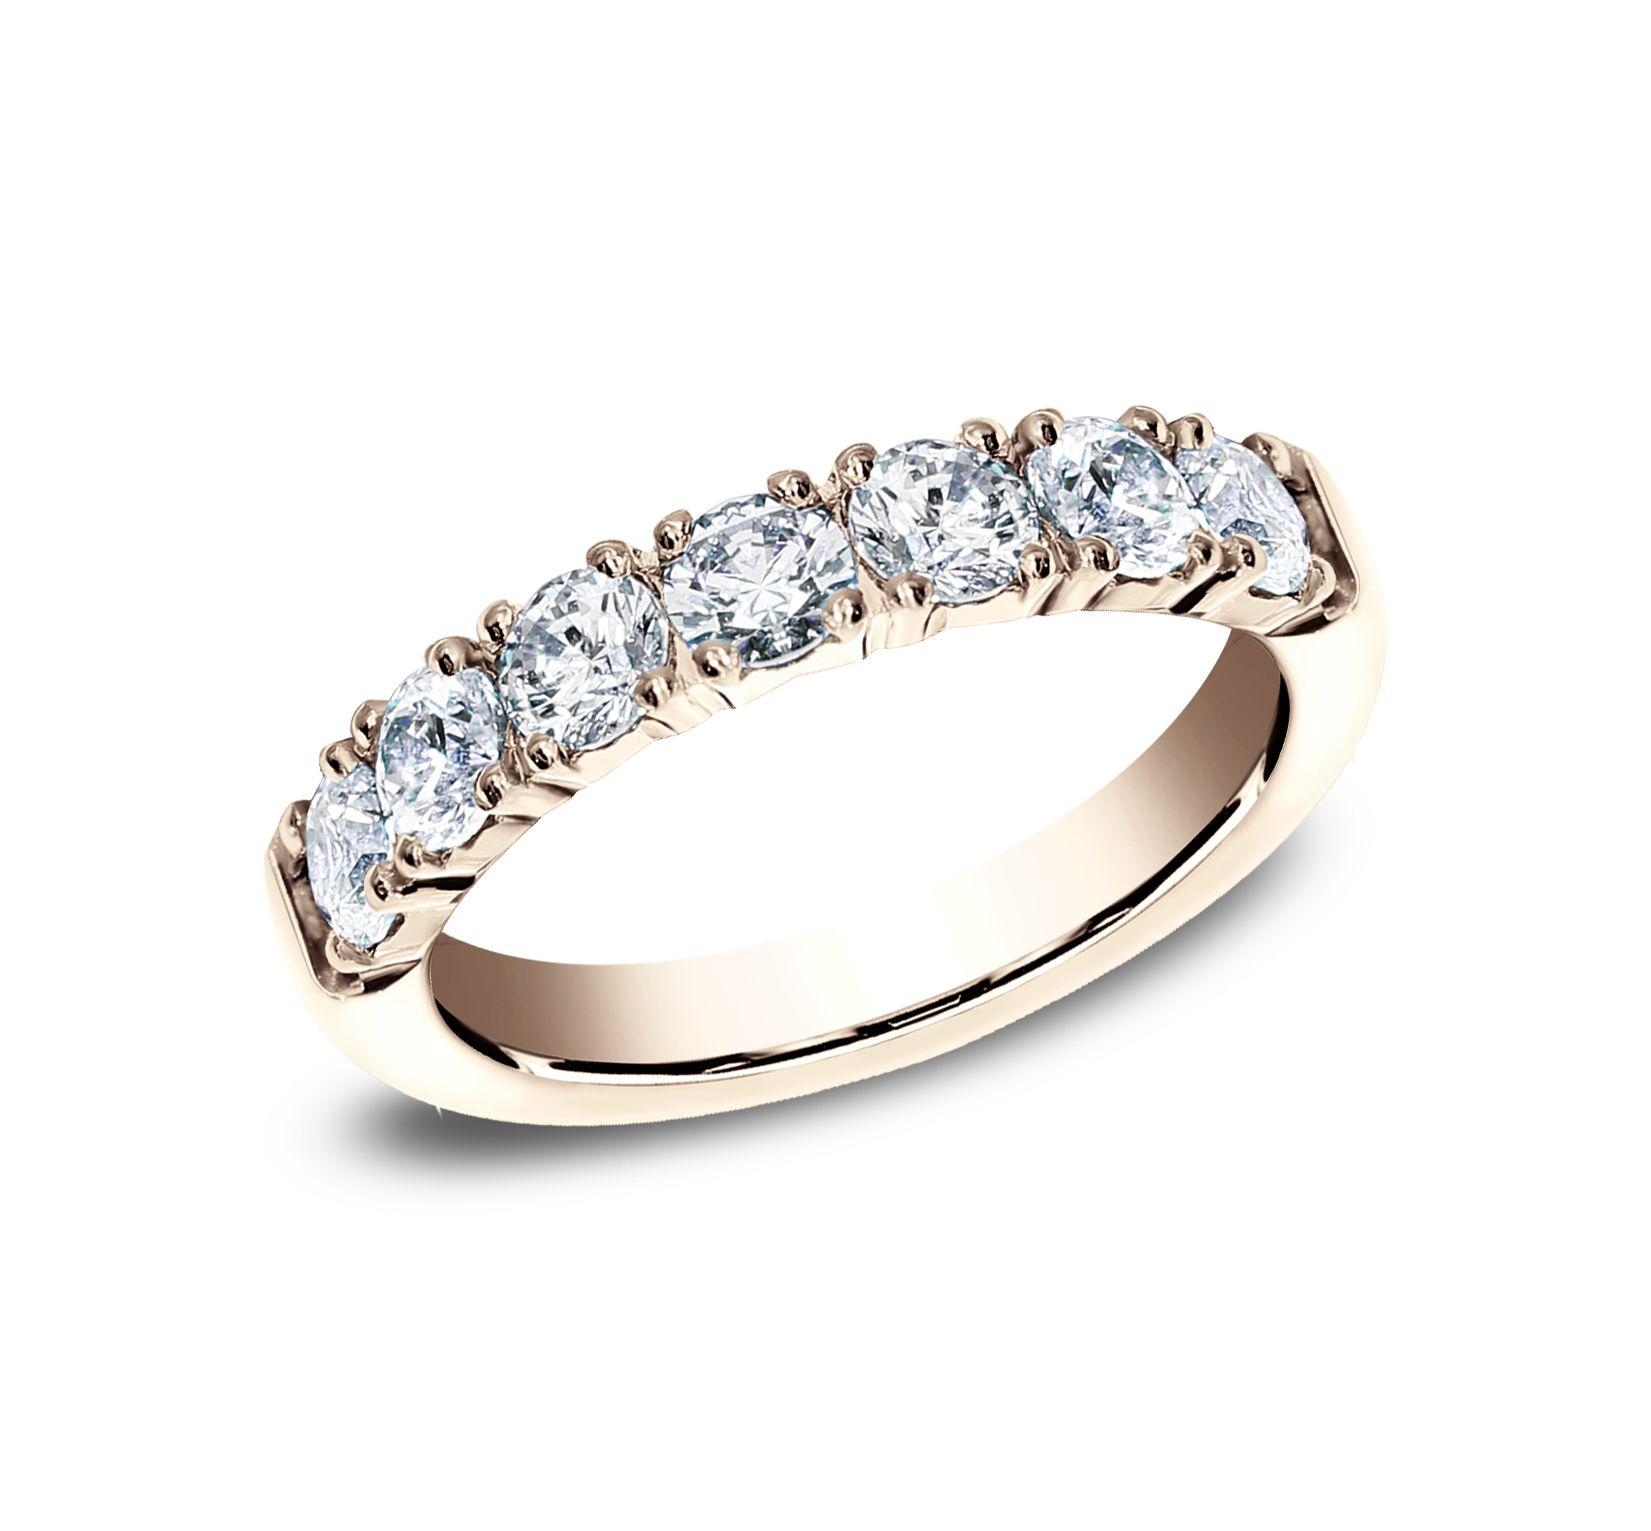 Benchmark Women S Diamond Wedding Bands Diamond Wedding Bands Womens Wedding Bands Diamond Wedding Bands